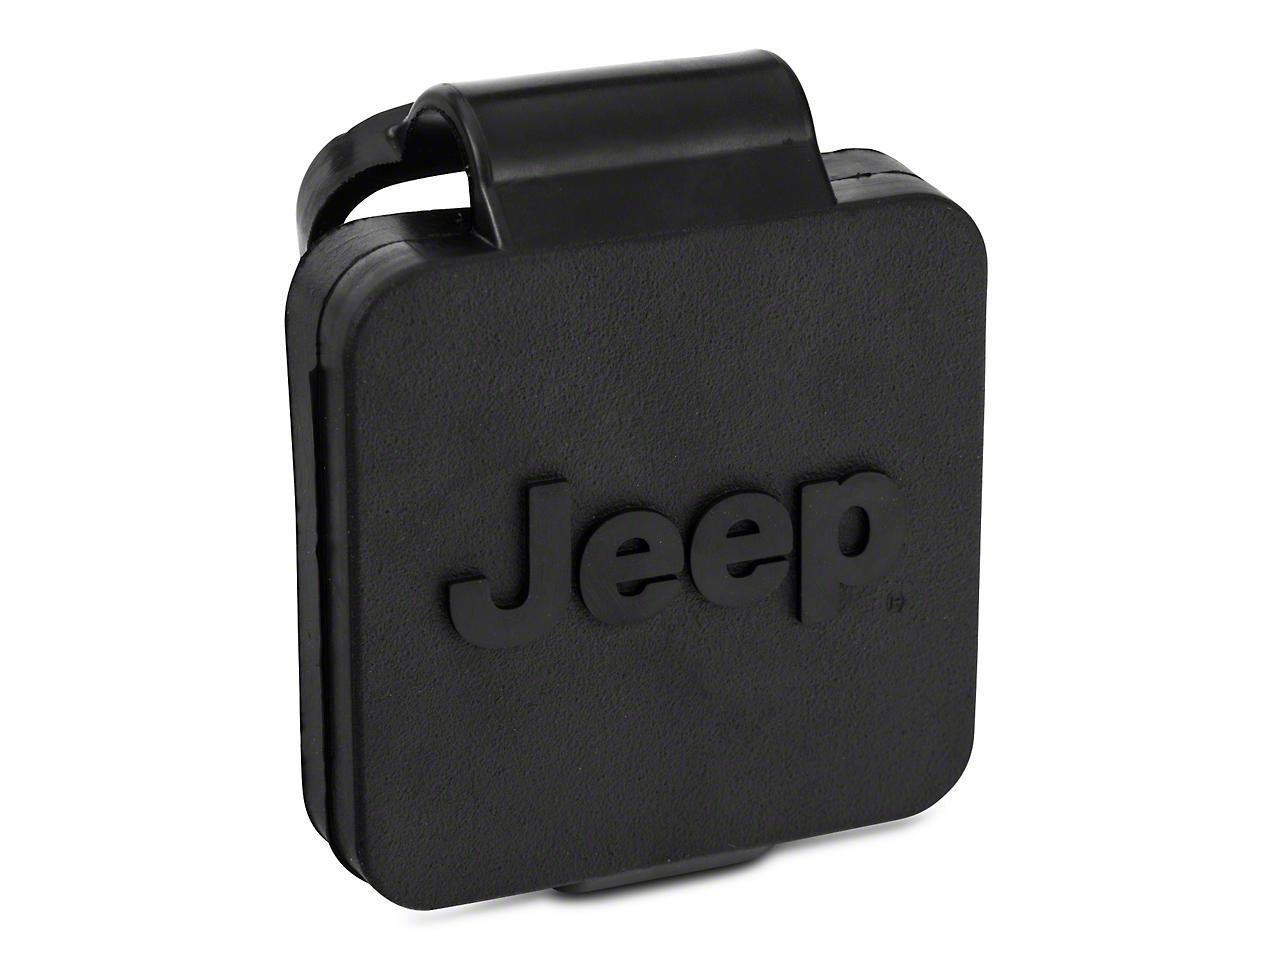 Mopar 2 in. Hitch Receiver Plug w/ Jeep Logo (87-18 Wrangler YJ, TJ, JK & JL)